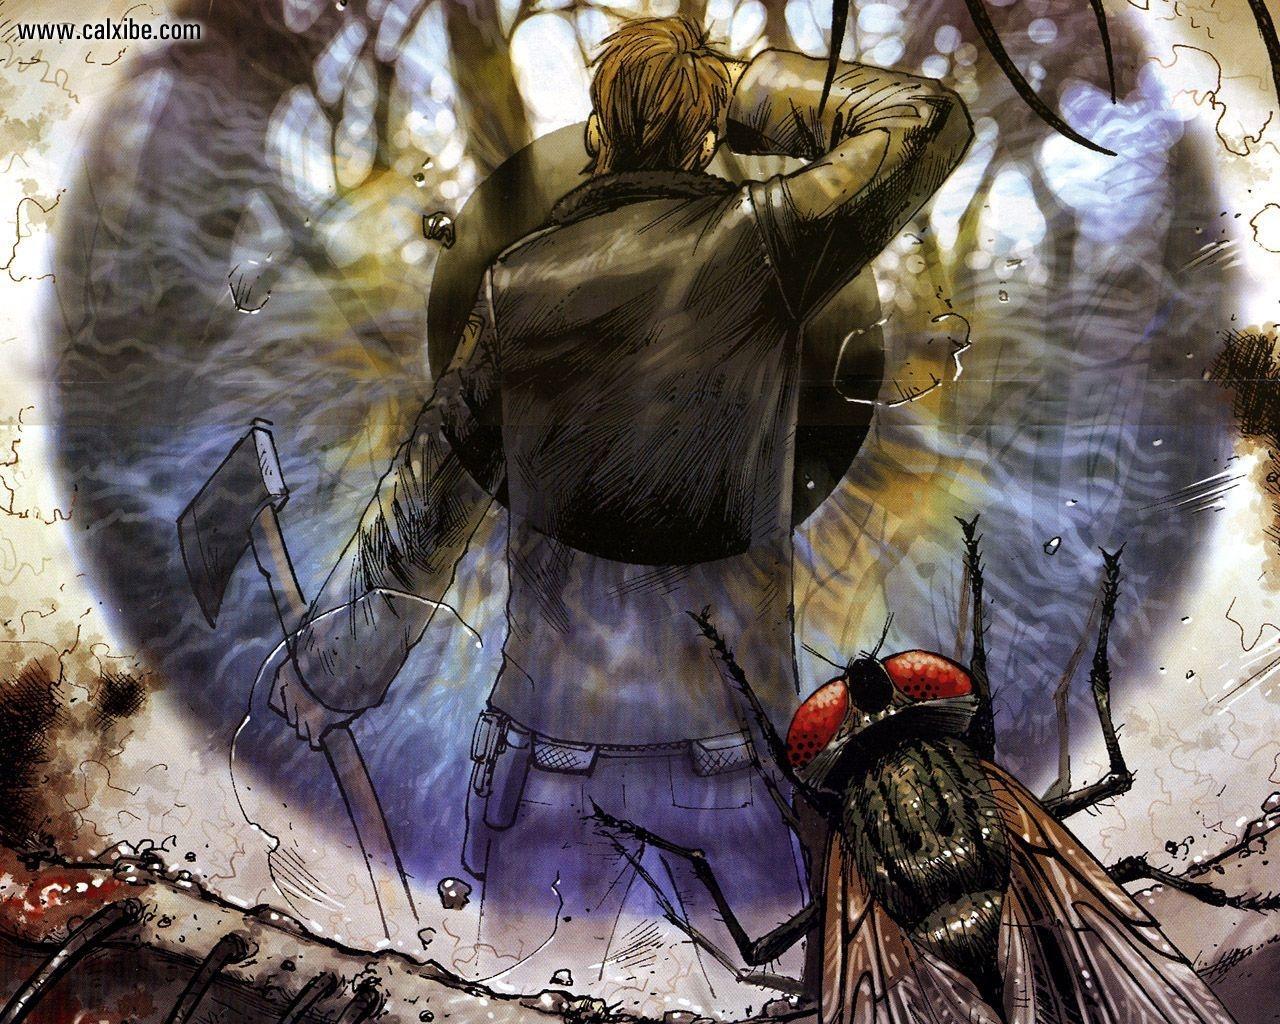 Walking Dead Wallpaper For Android: The Walking Dead Wallpaper HD Download